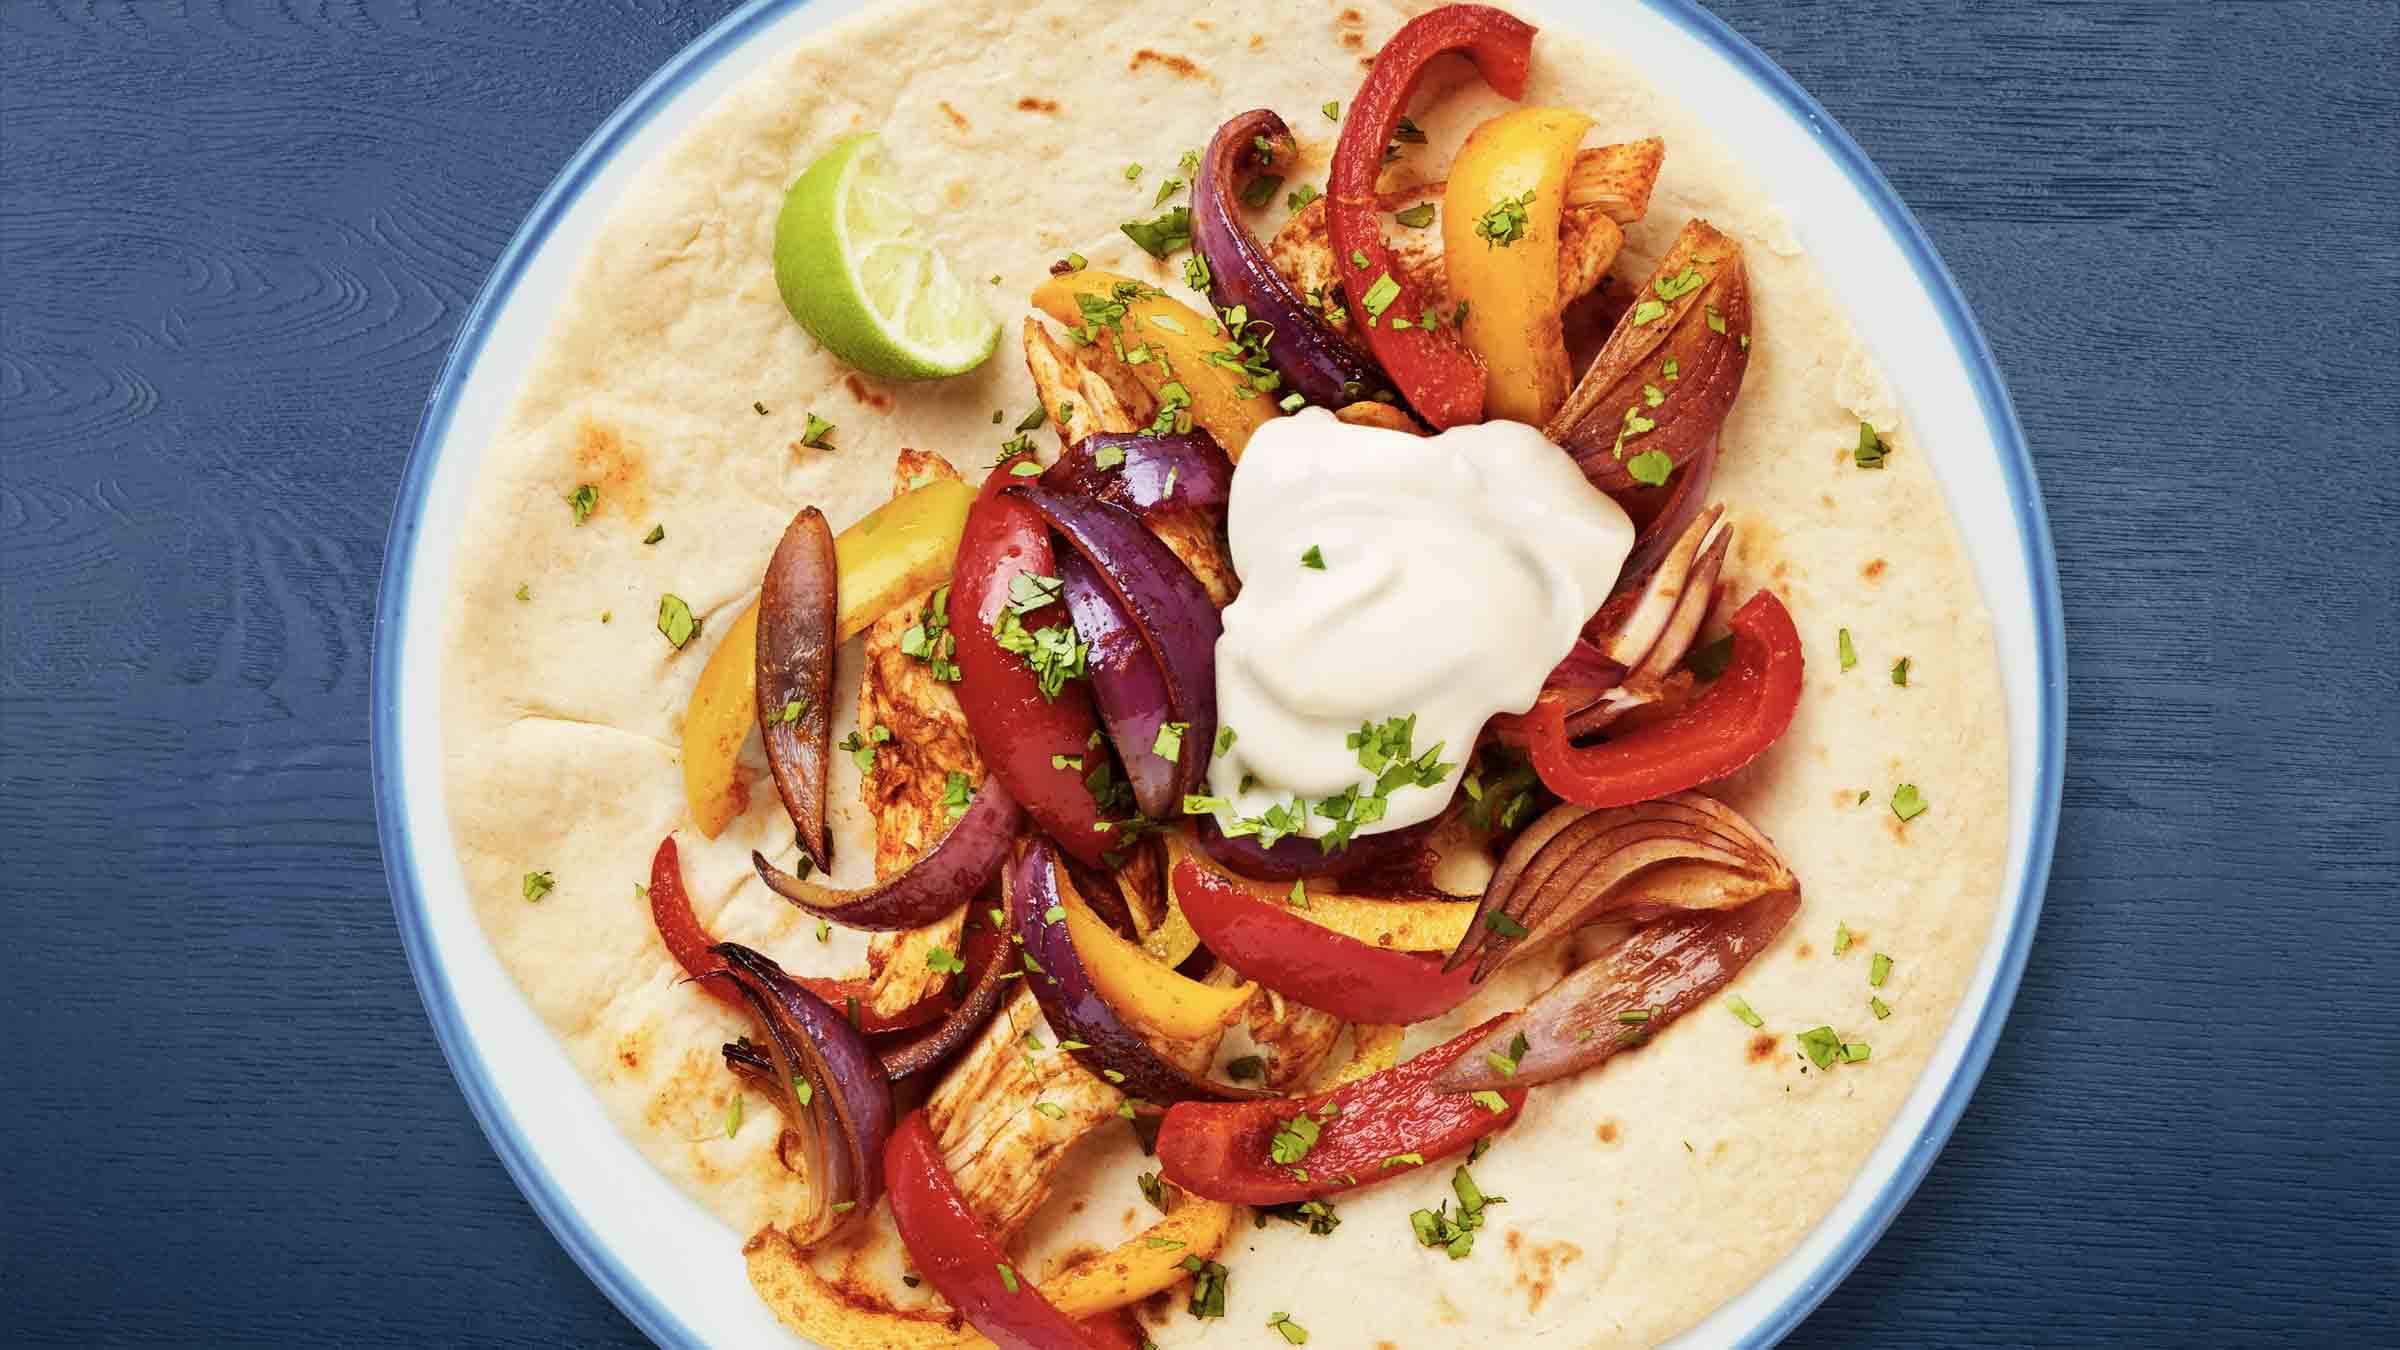 Quick & Easy Spicy Pepper & Chicken  Wrap Recipe